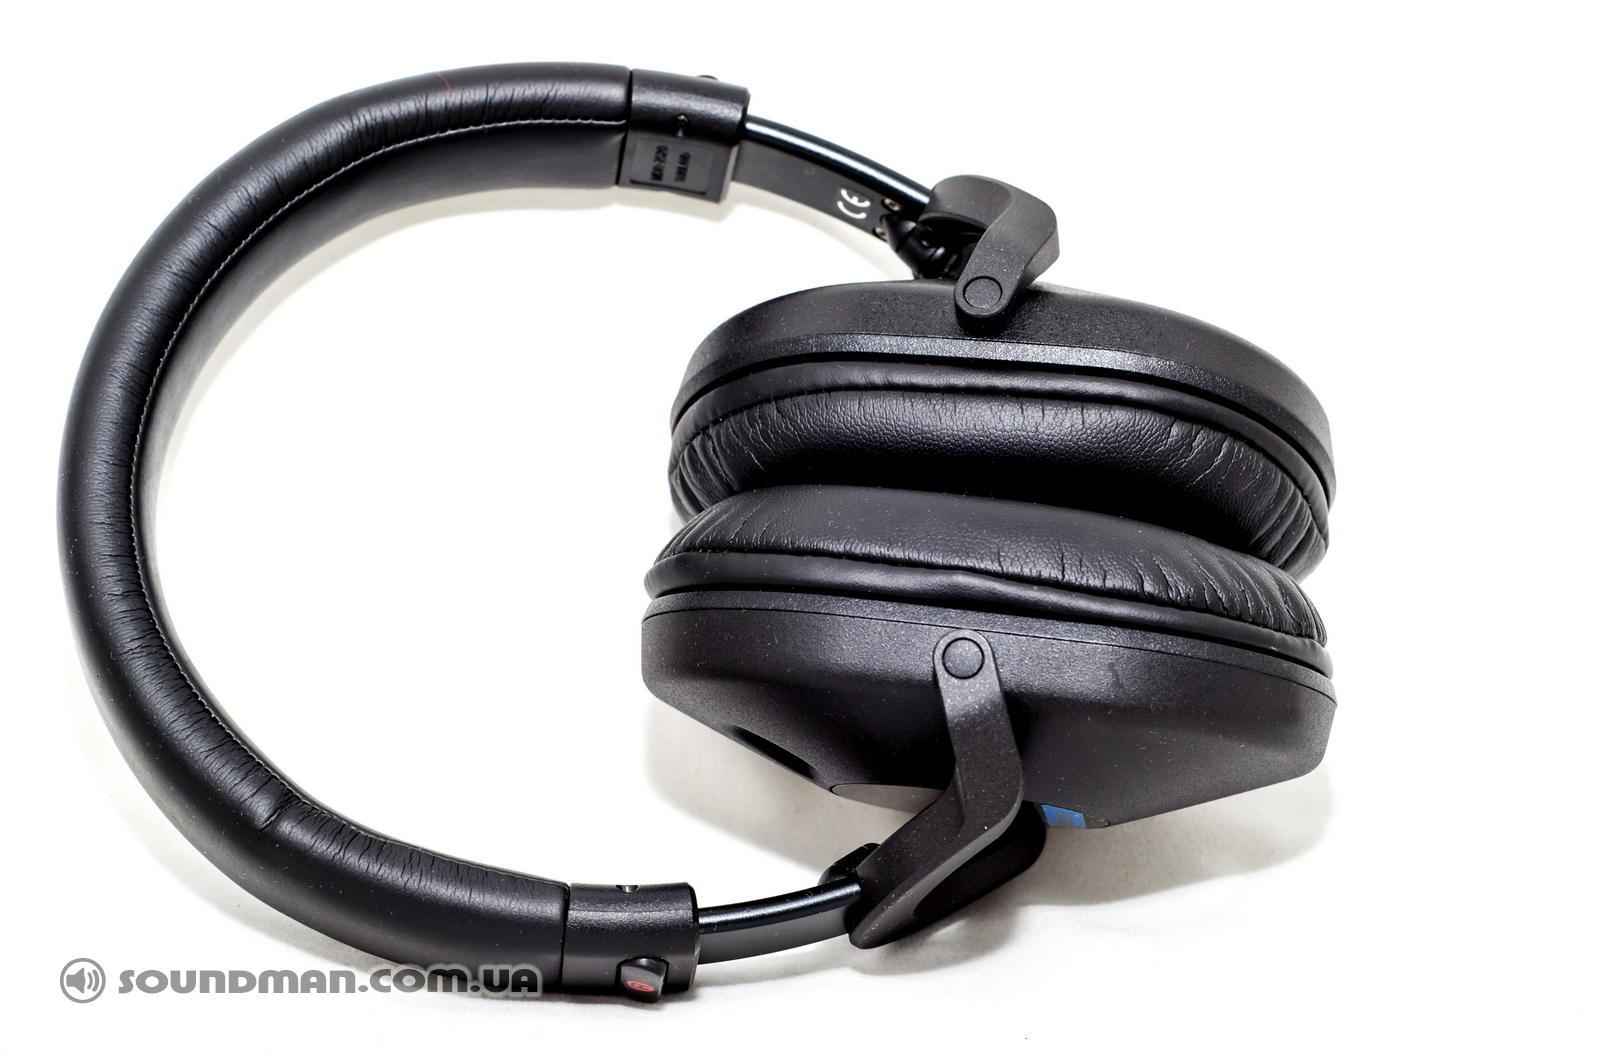 Sony MDR-7520